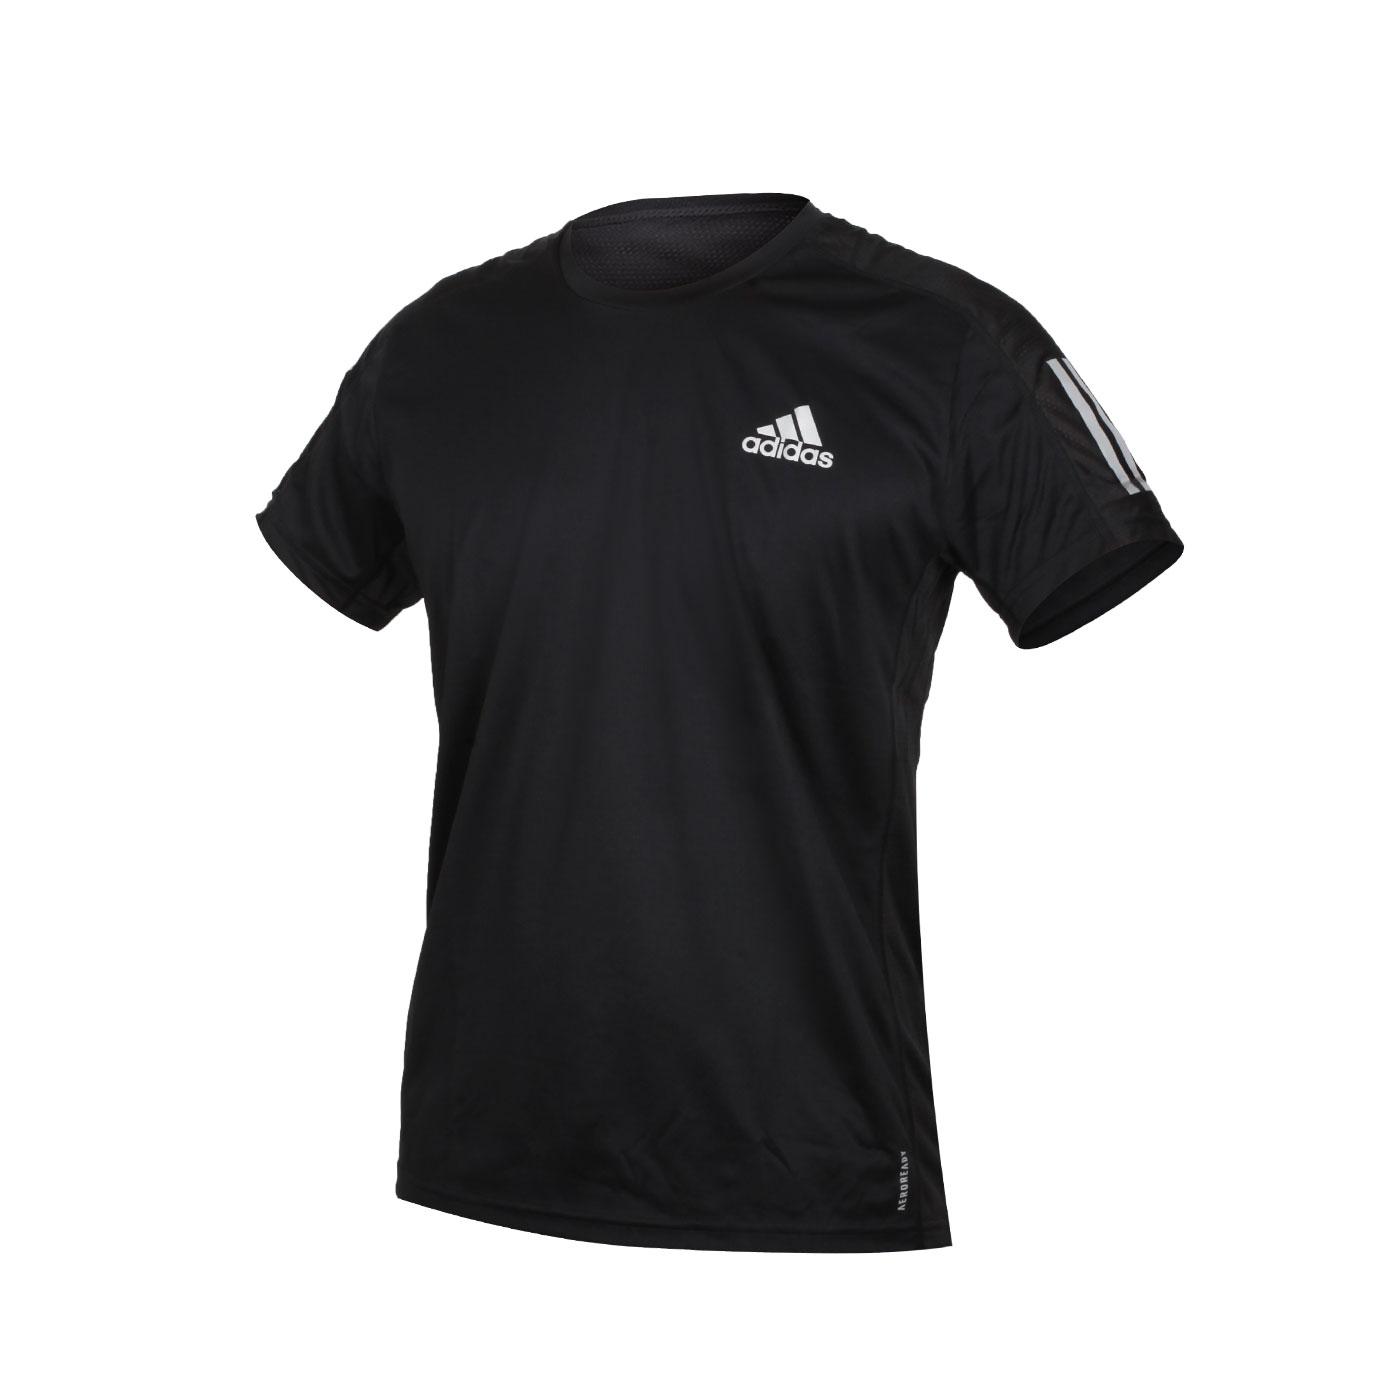 ADIDAS 男款短袖T恤 FS9799 - 黑銀